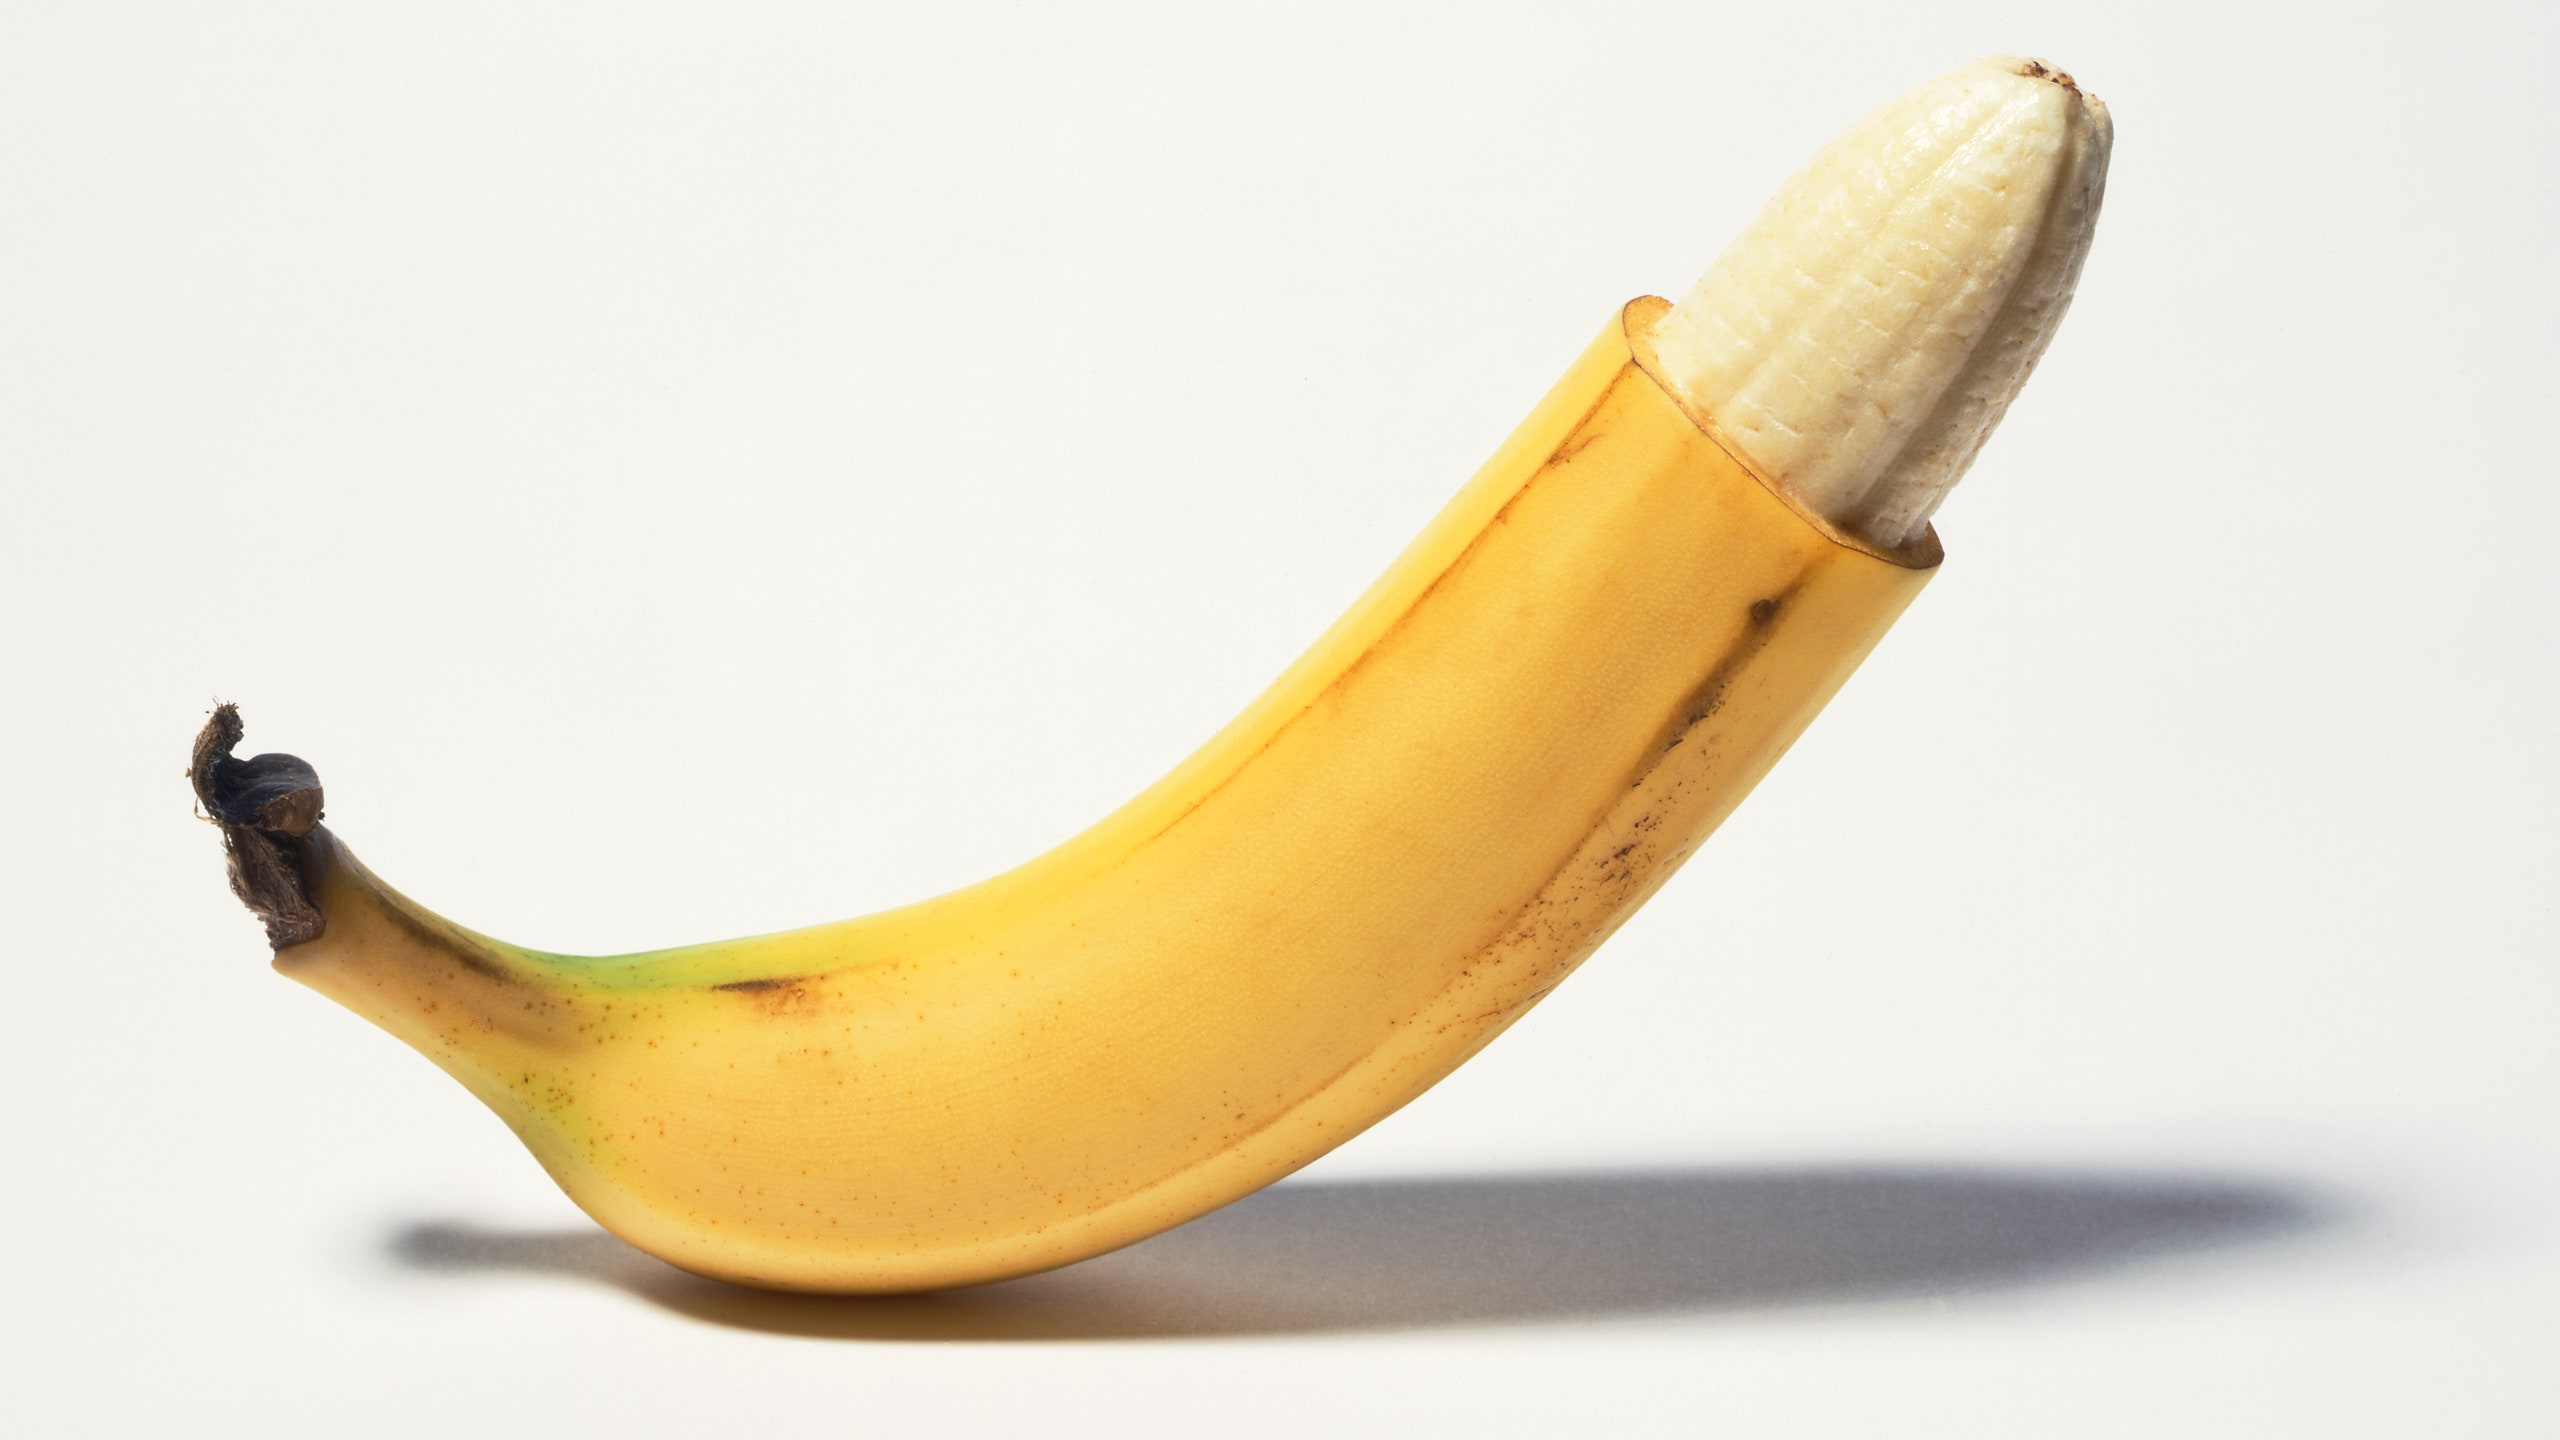 Weird long penis foreskin penises